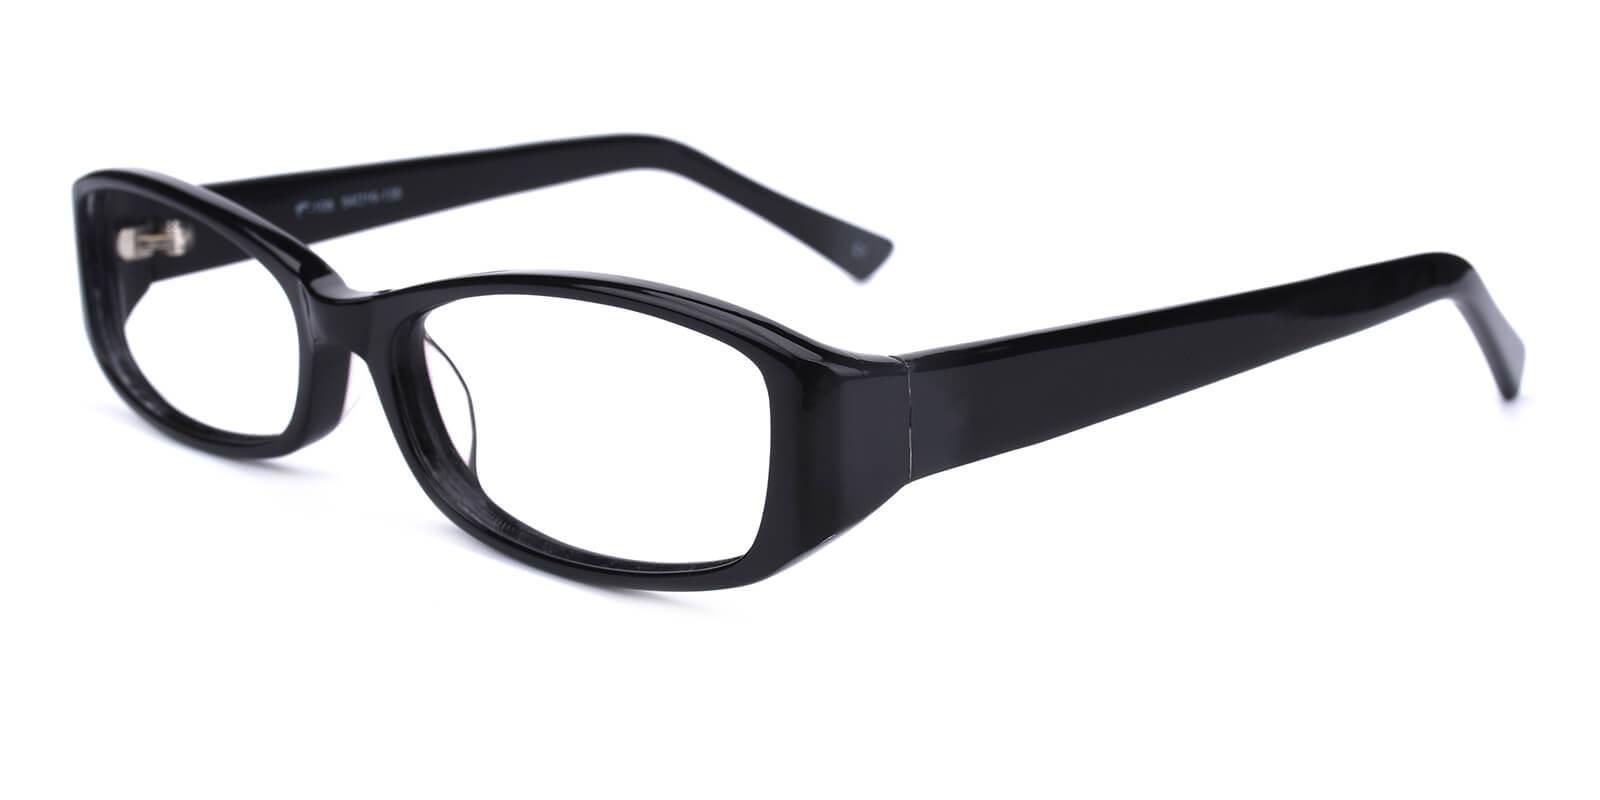 Muse-Black-Rectangle-Acetate-Eyeglasses-detail